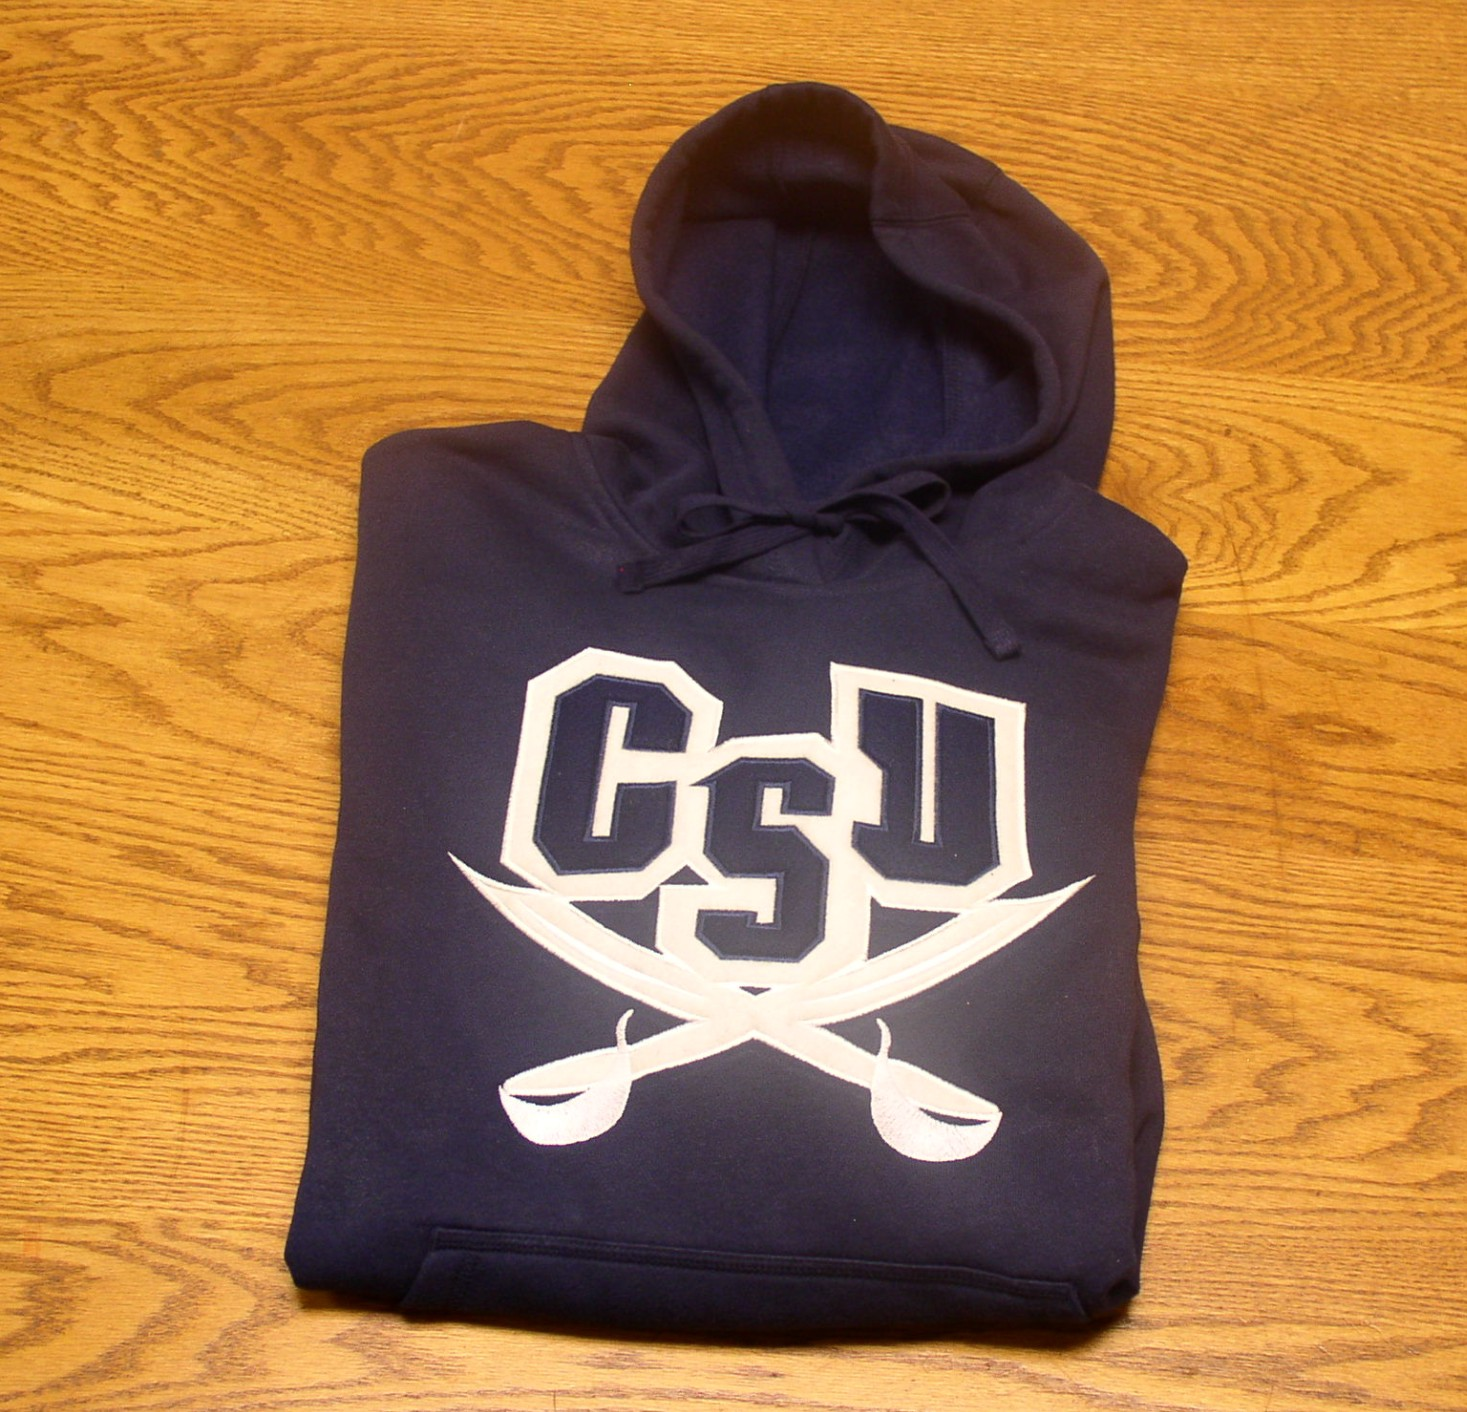 CSU_sweatshirt.jpg